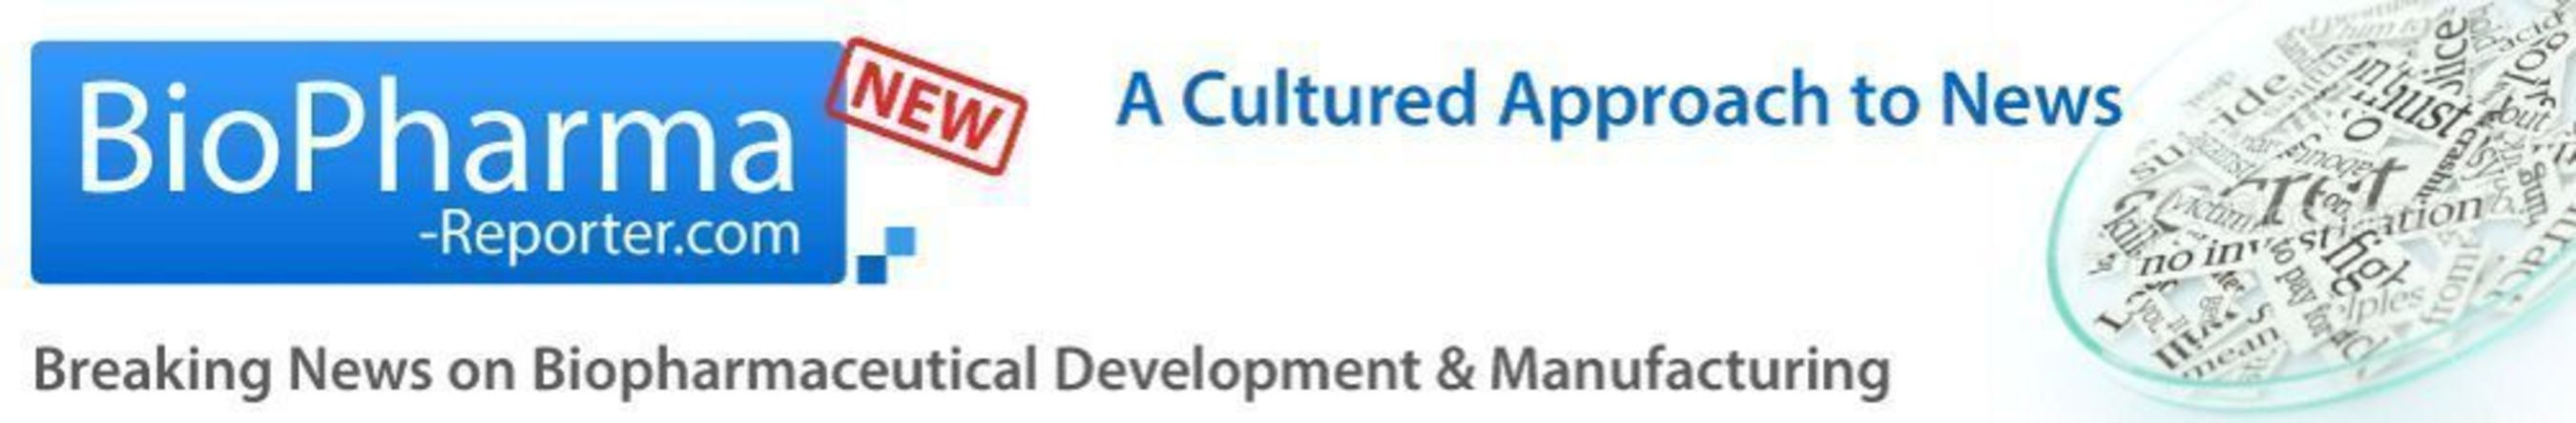 BioPharma Banner (PRNewsFoto/William Reed Business Media)